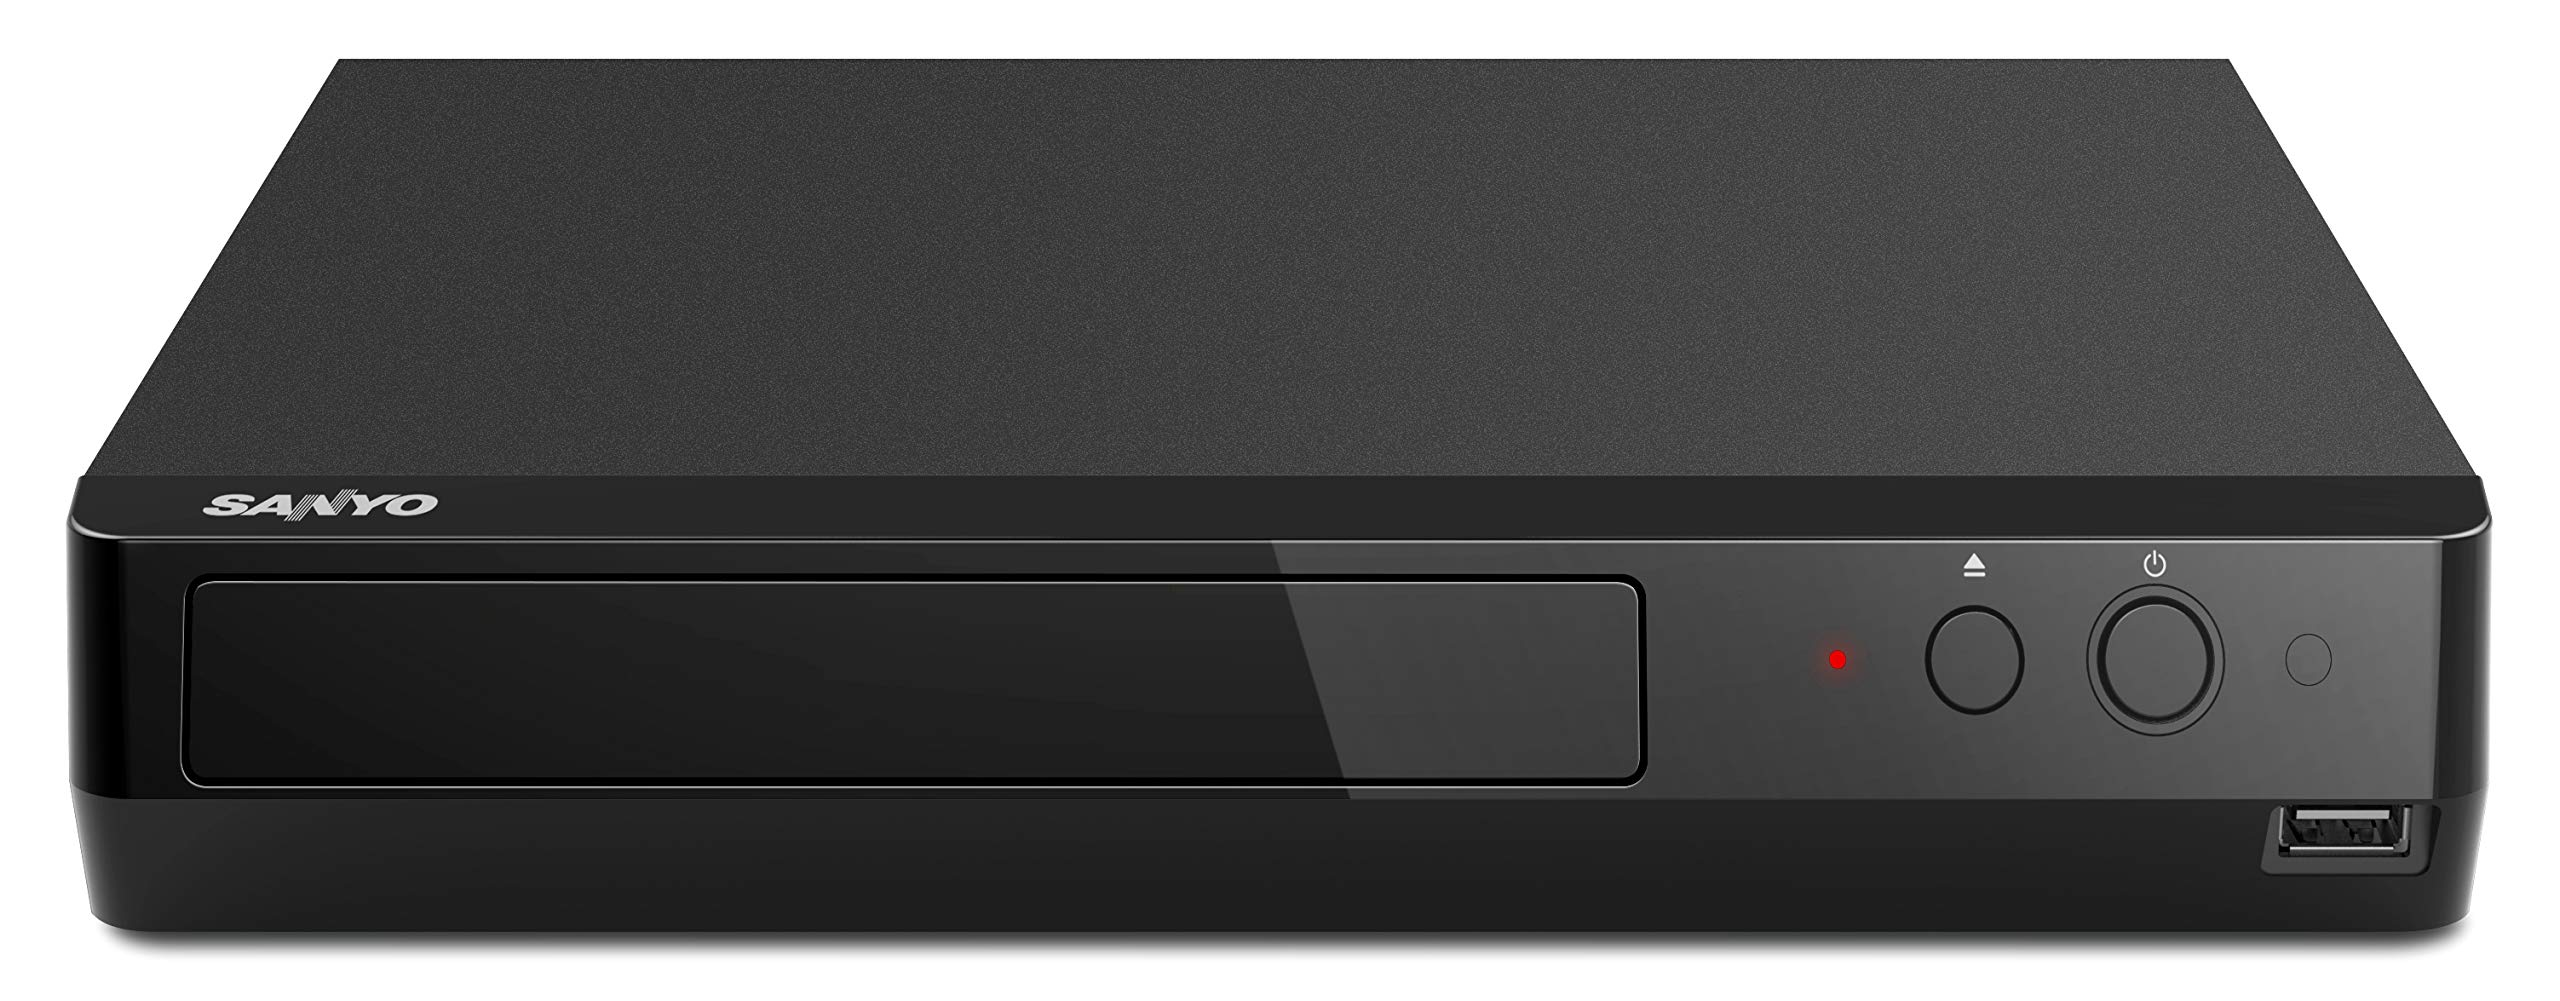 Sanyo 4K Ultra HD Blu-ray Player (Certified Renewed) by SANYO